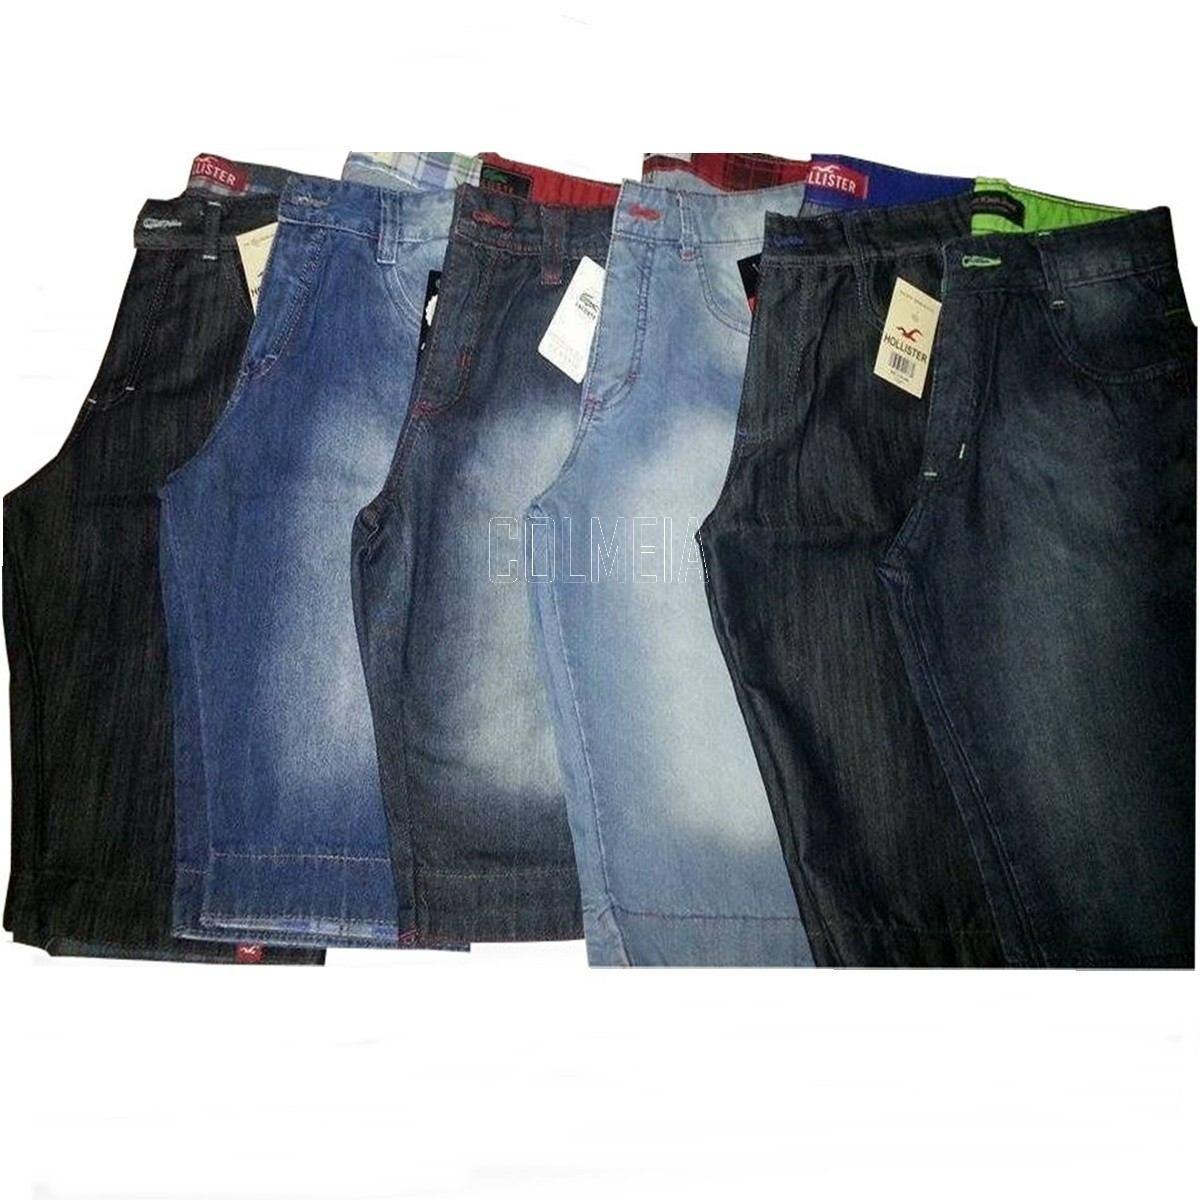 Kit C/ 3 Bermudas Jeans Masculinas Diversas Marcas